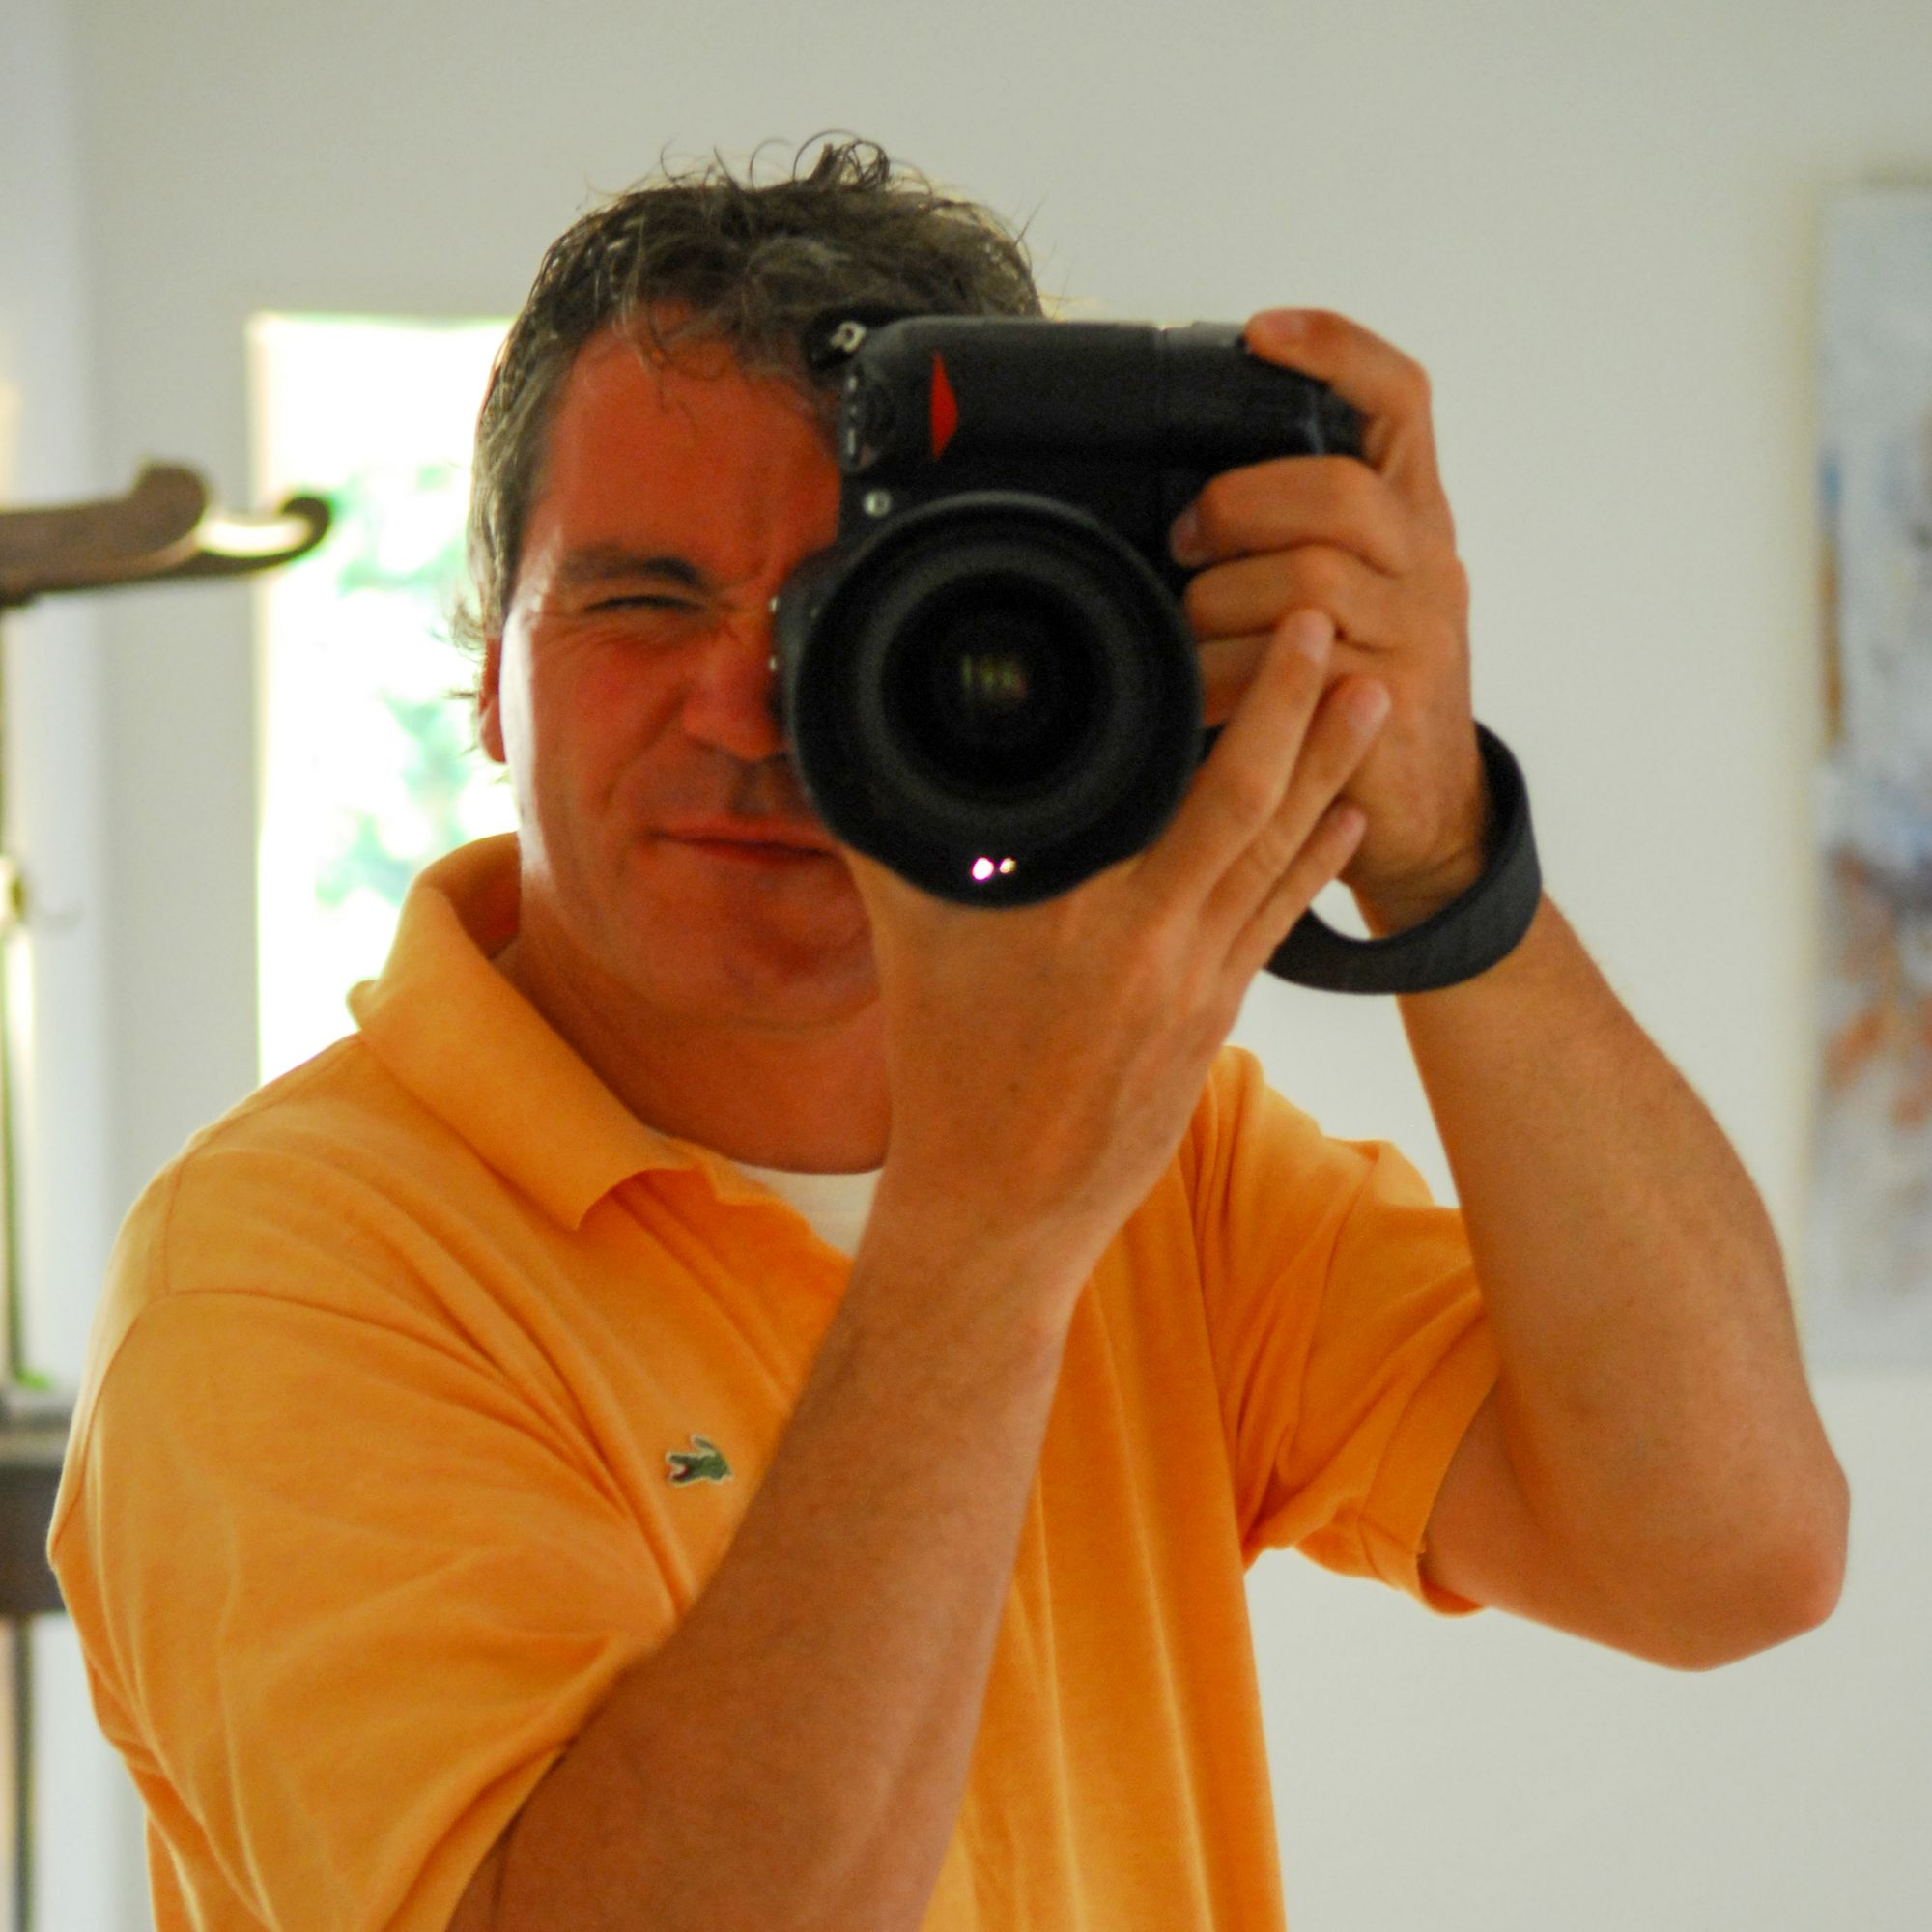 Fotograf Svend Krumnacker 2007 Nikon D200 17-55mm/2.8